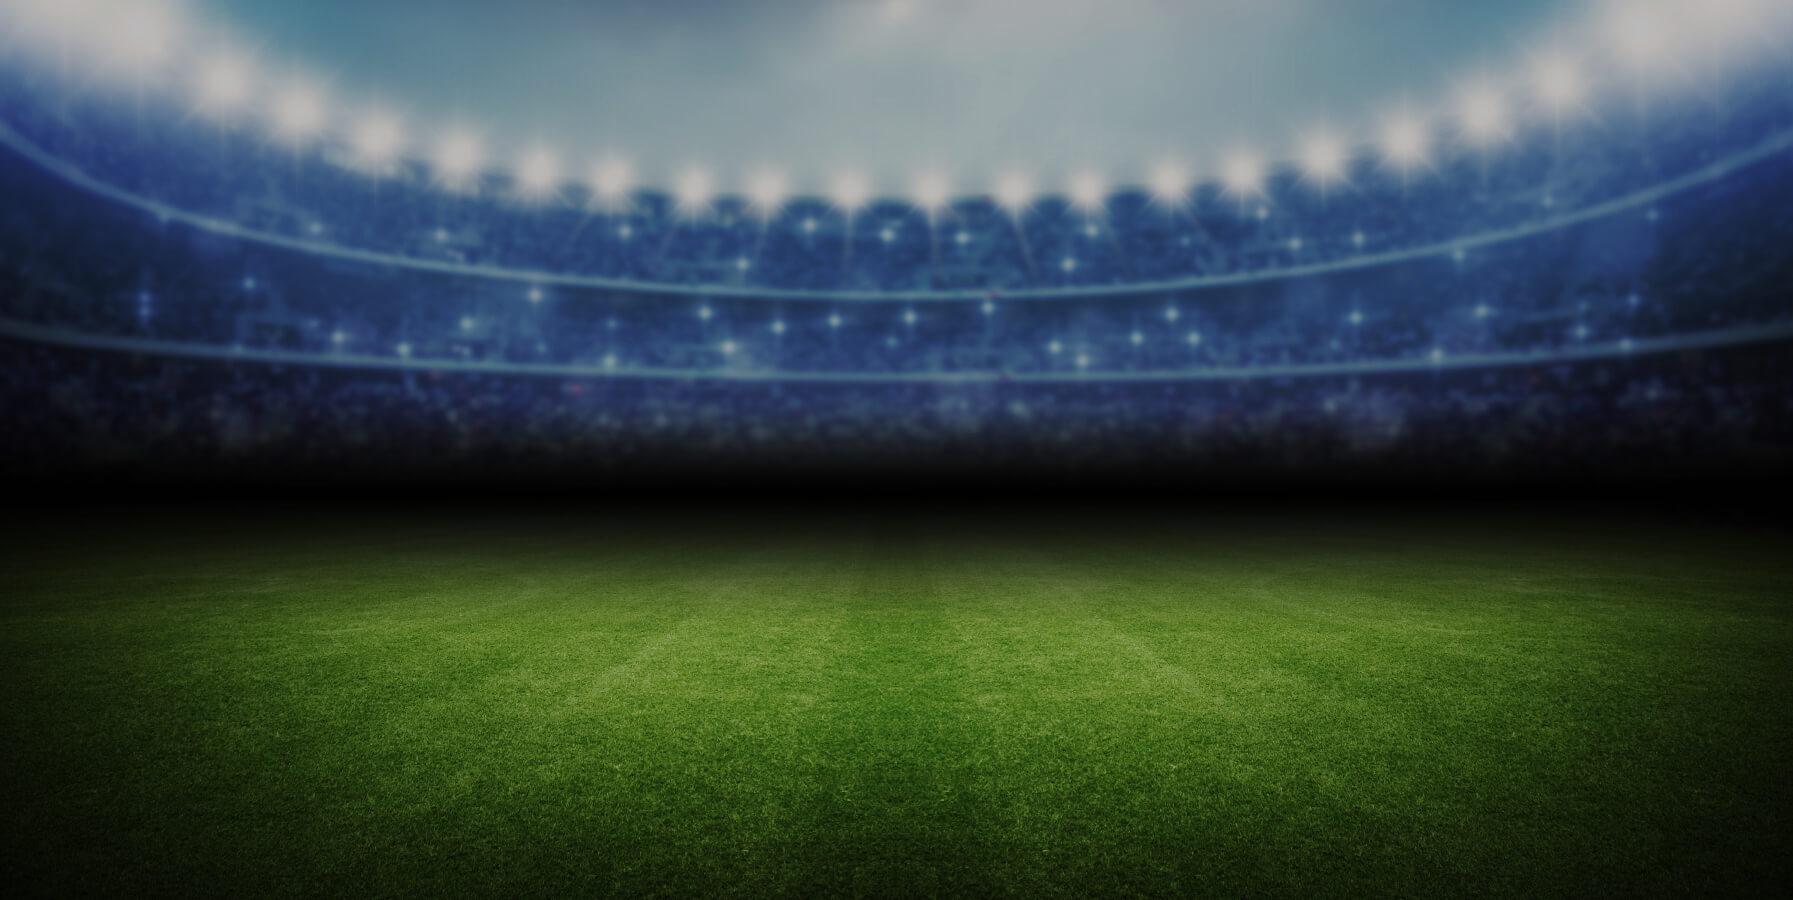 Stadium thesocialbet background